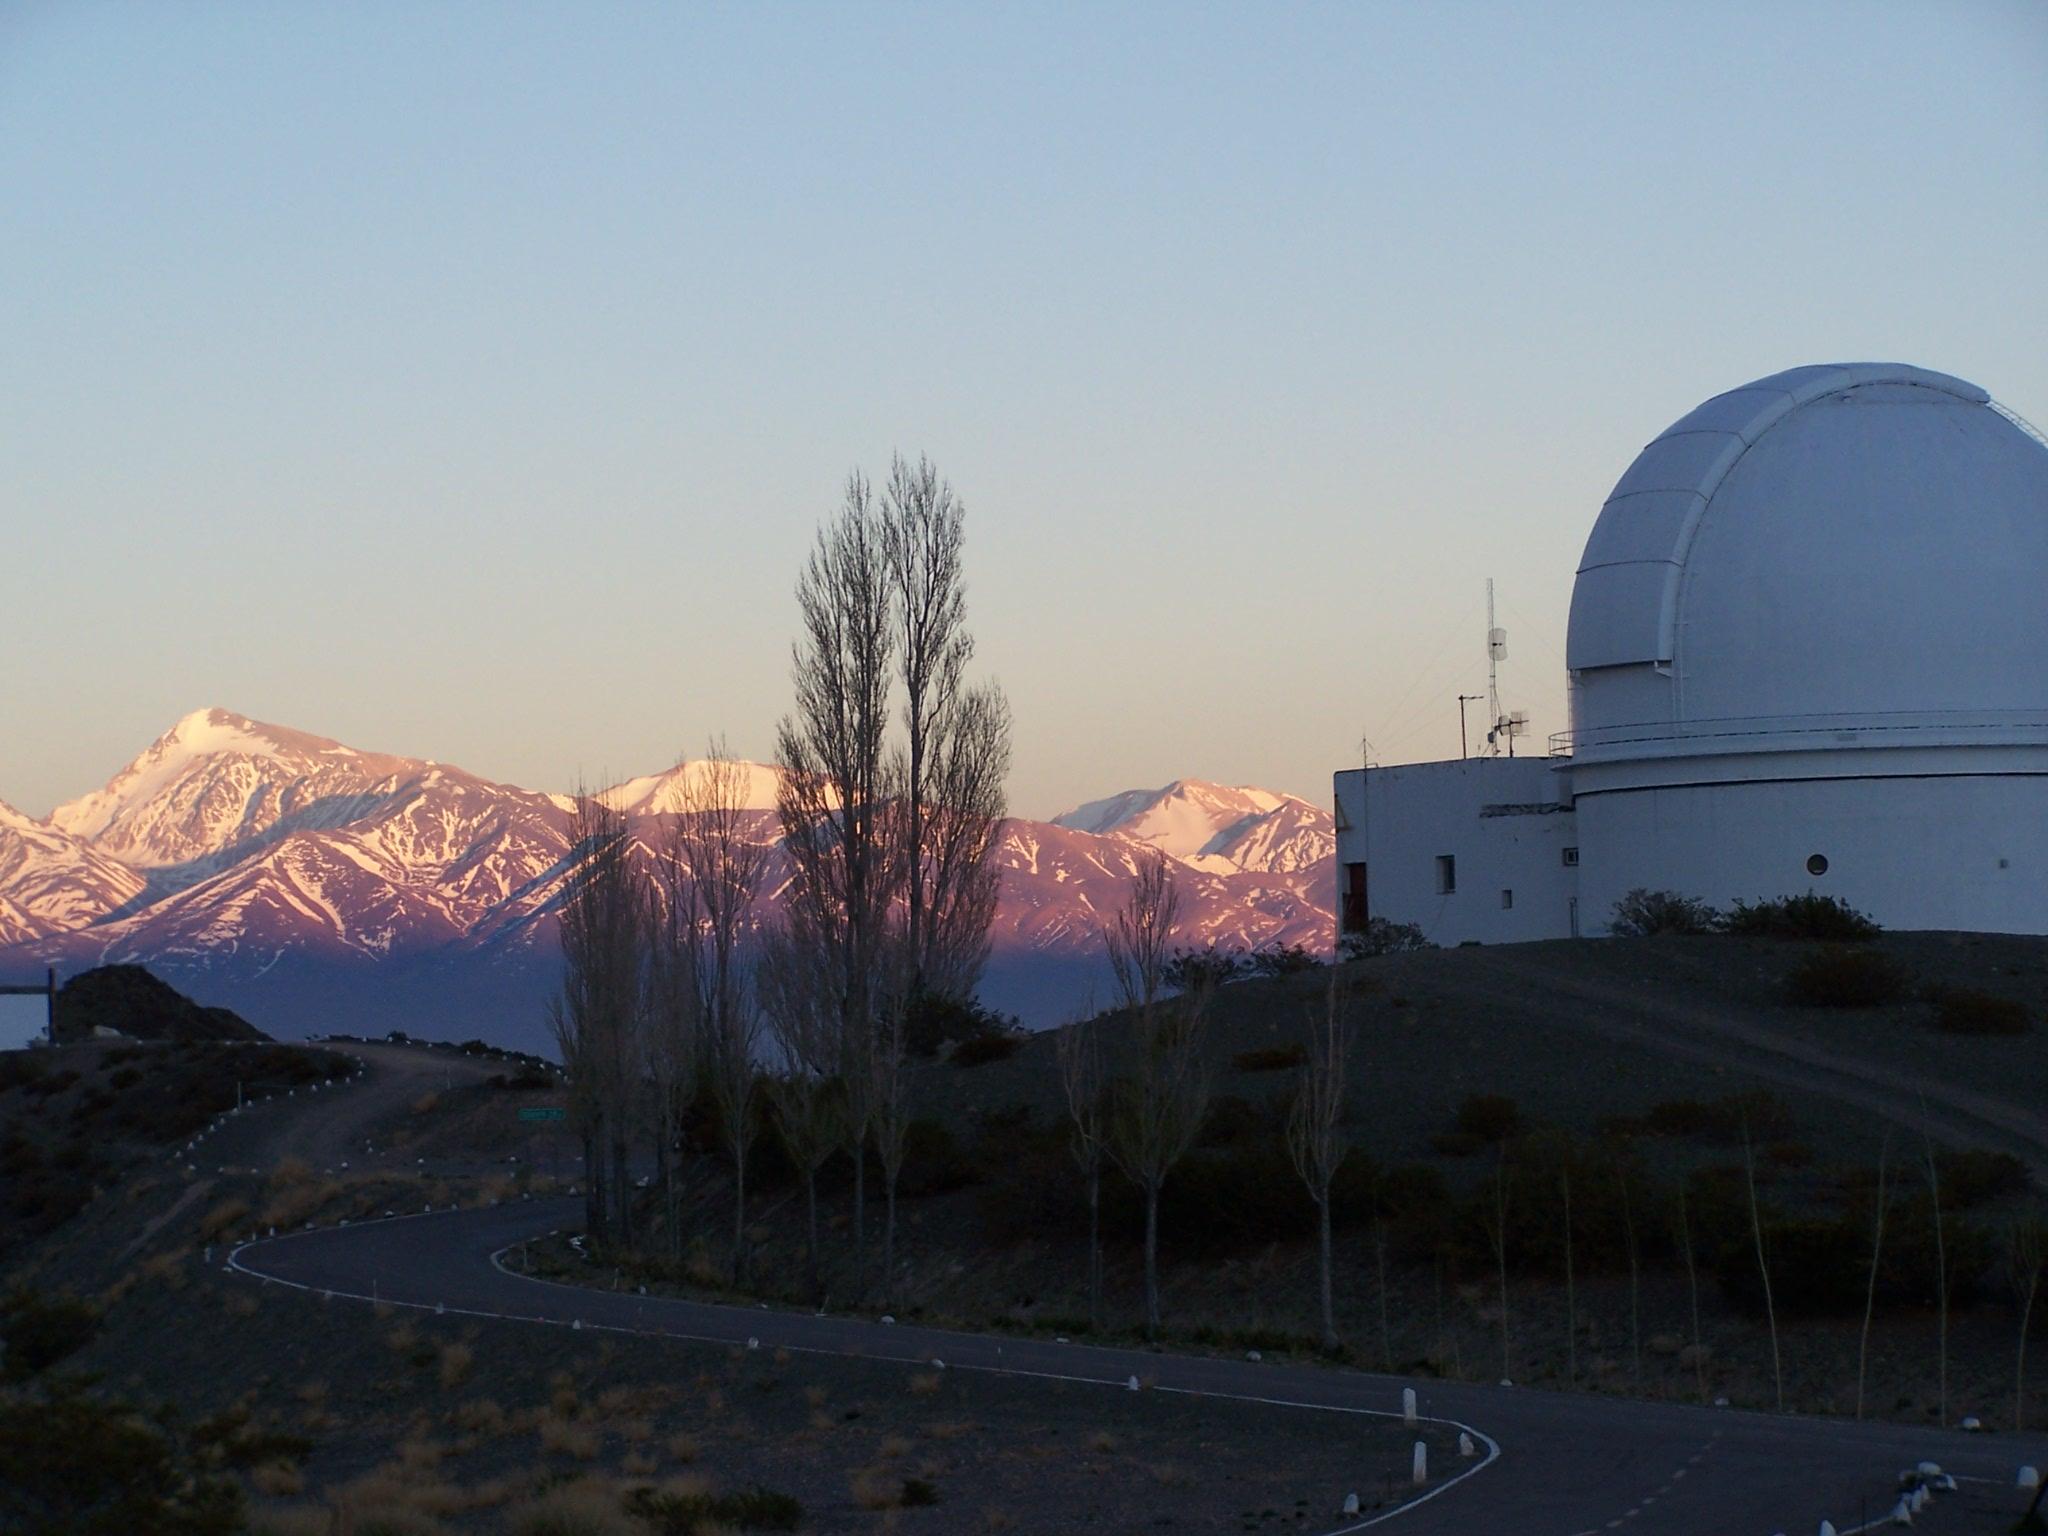 Observatorio_El_Leoncito,_Calingasta.jpg